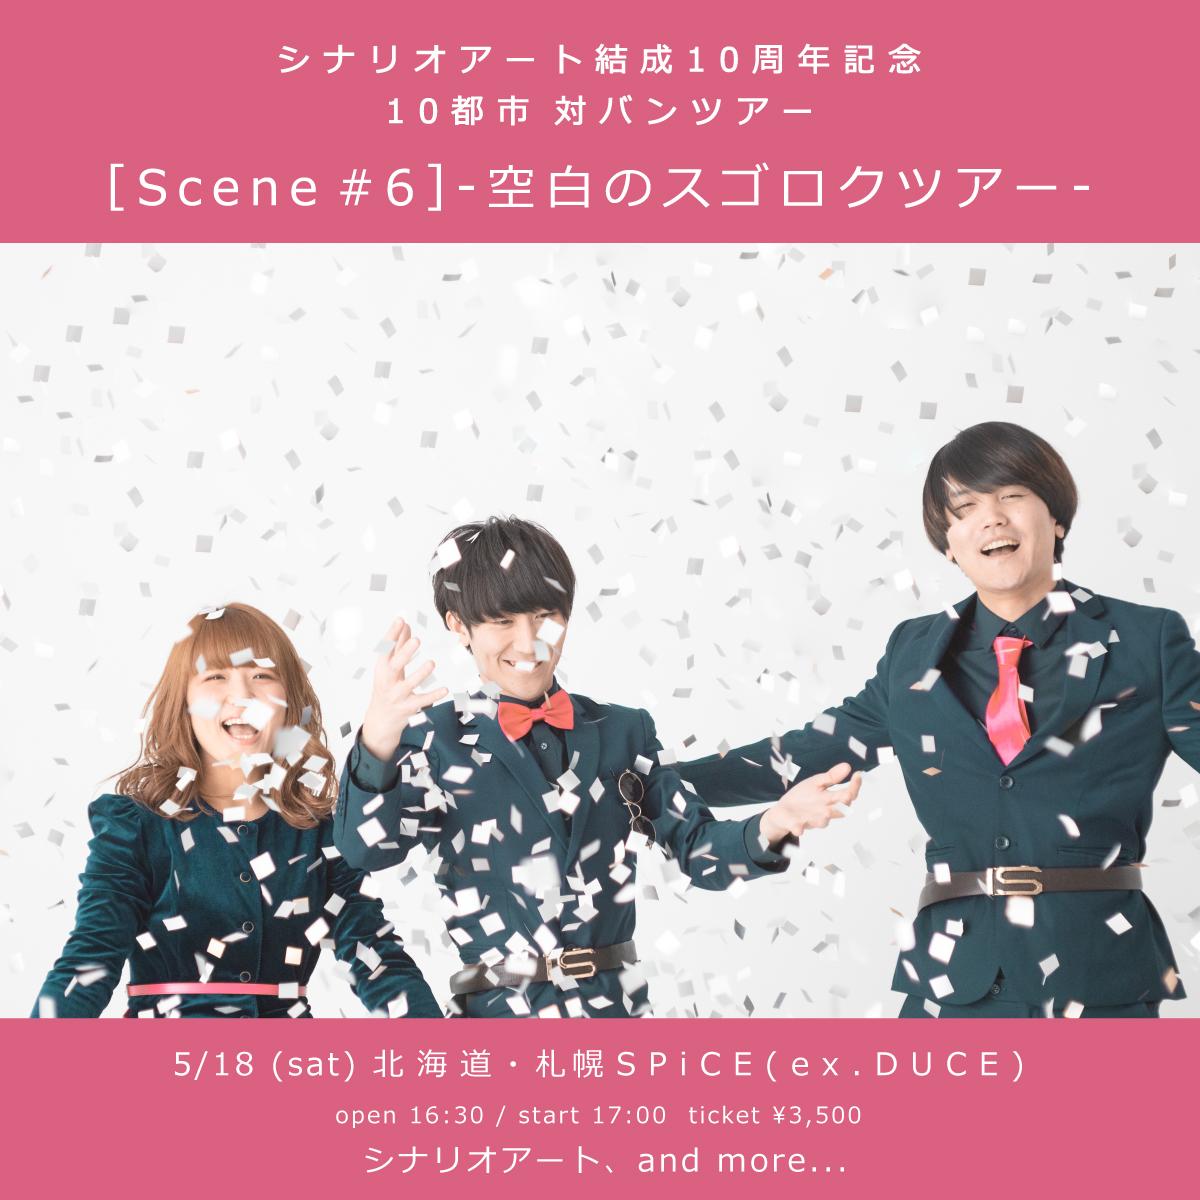 [Scene #6]-空白のスゴロクツアー- 《北海道公演》